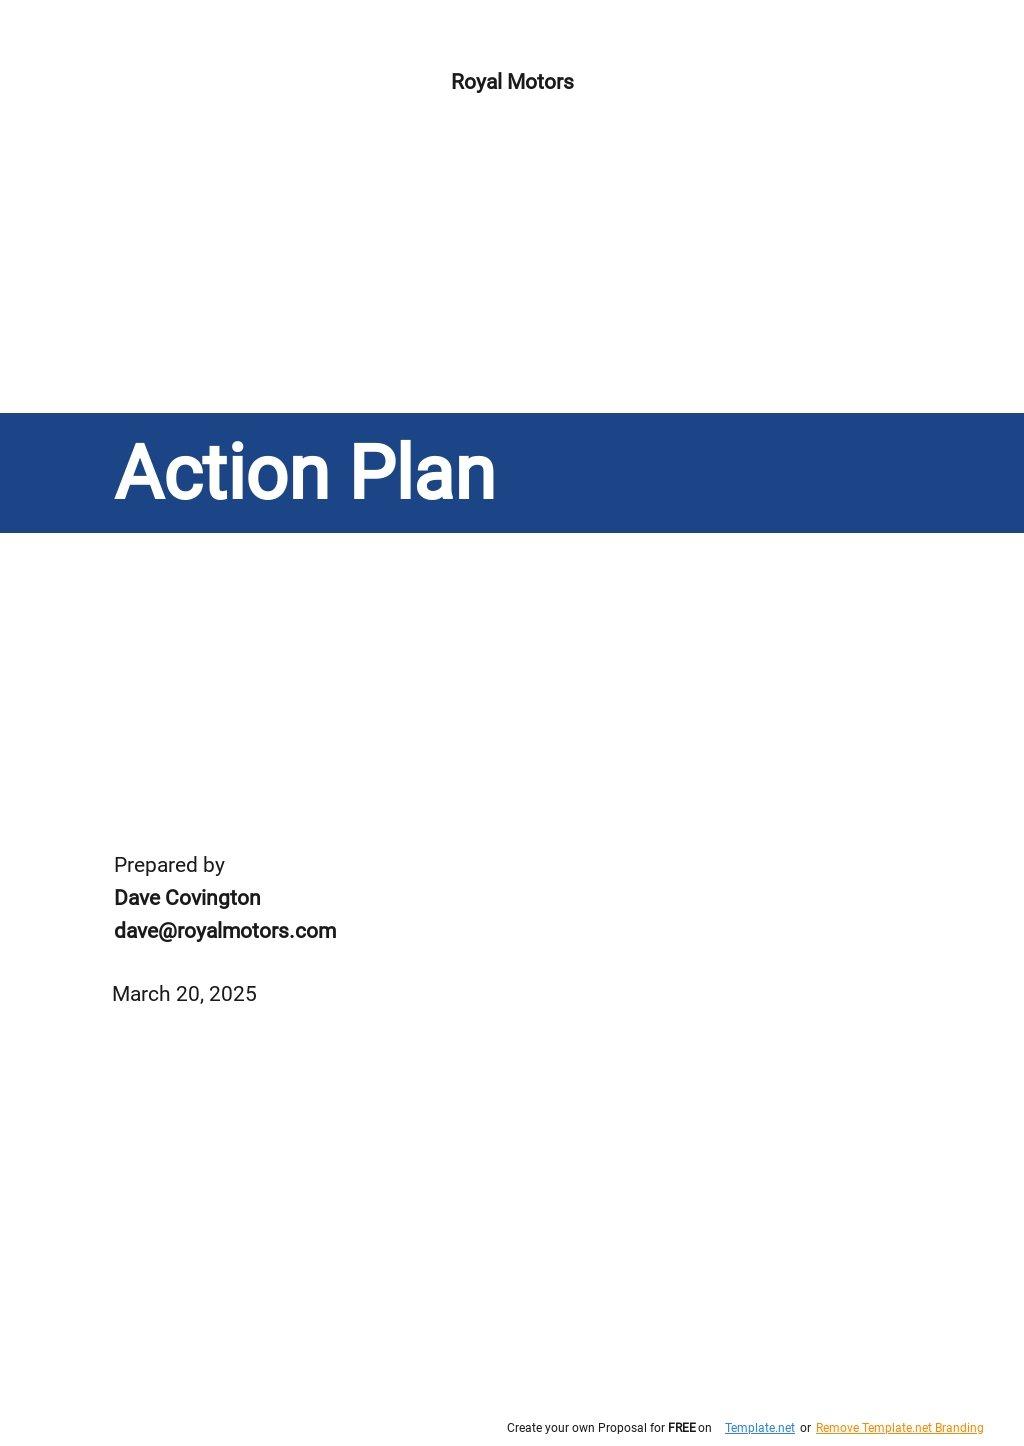 Action Plan Template.jpe